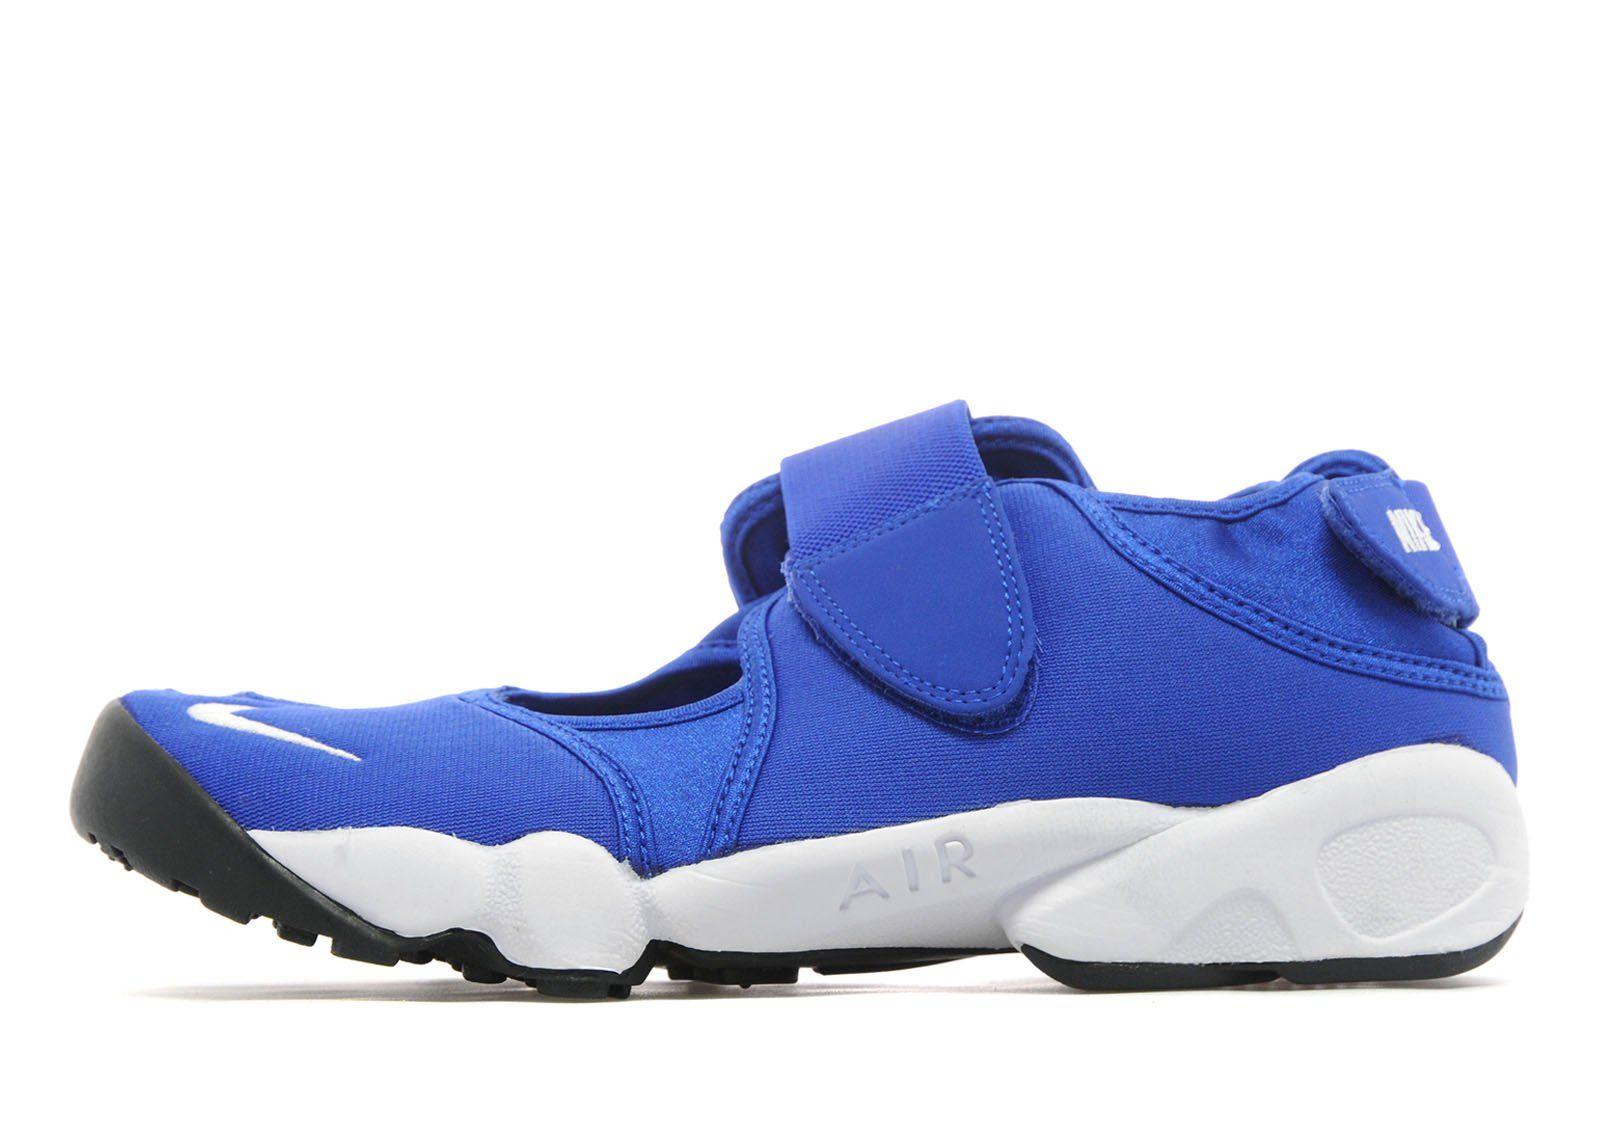 Nike Air Rift